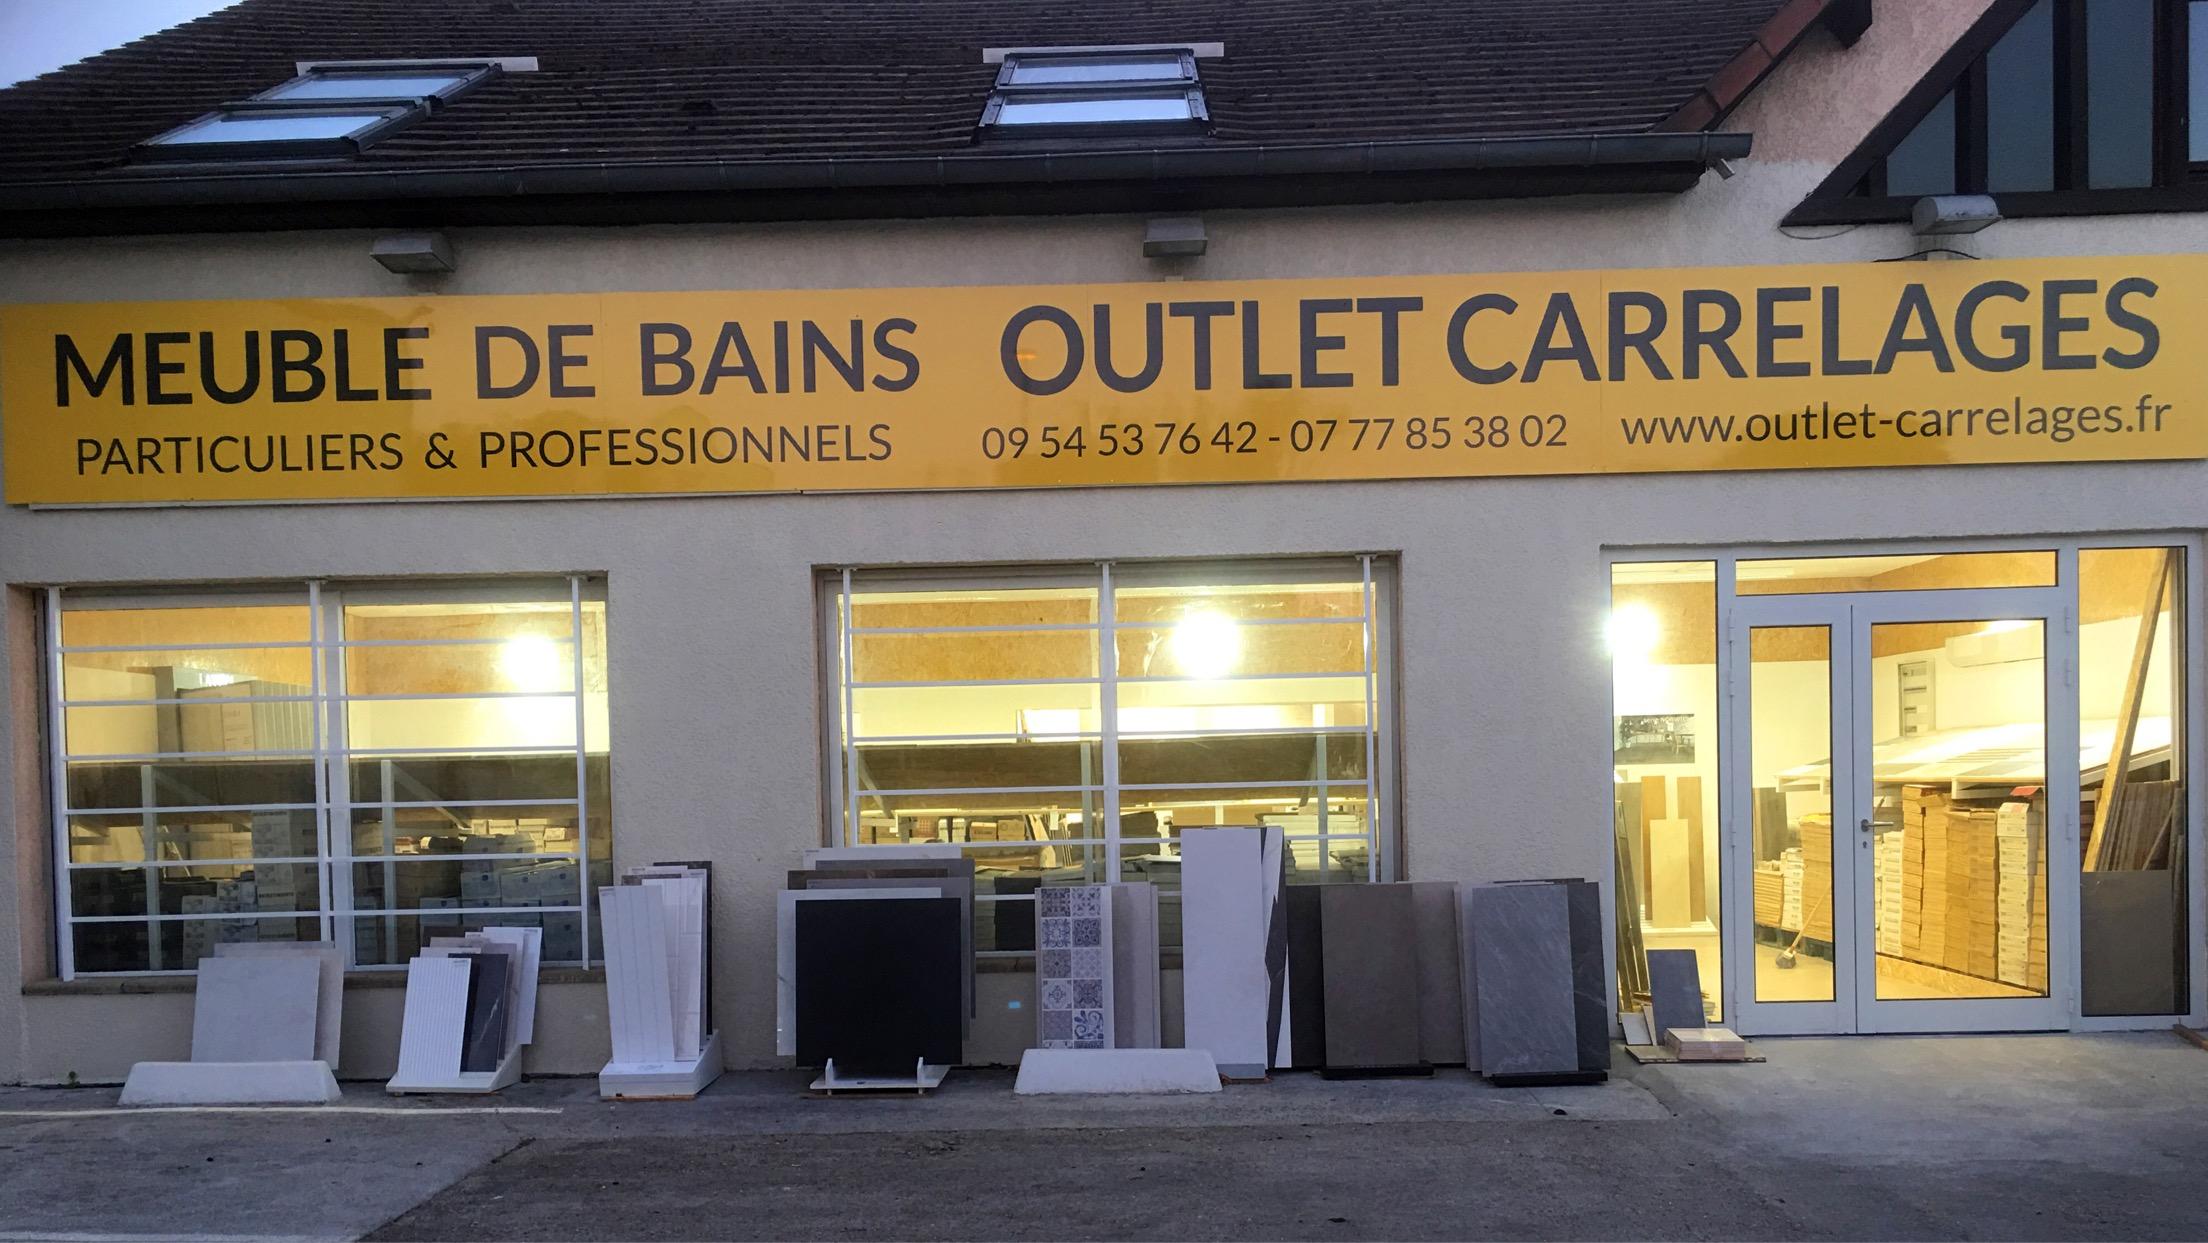 Outlet Carrelages A Conflans Sainte Honorine 78700 Rue Des Cayennes Adresse Horaires Telephone 118000 Fr